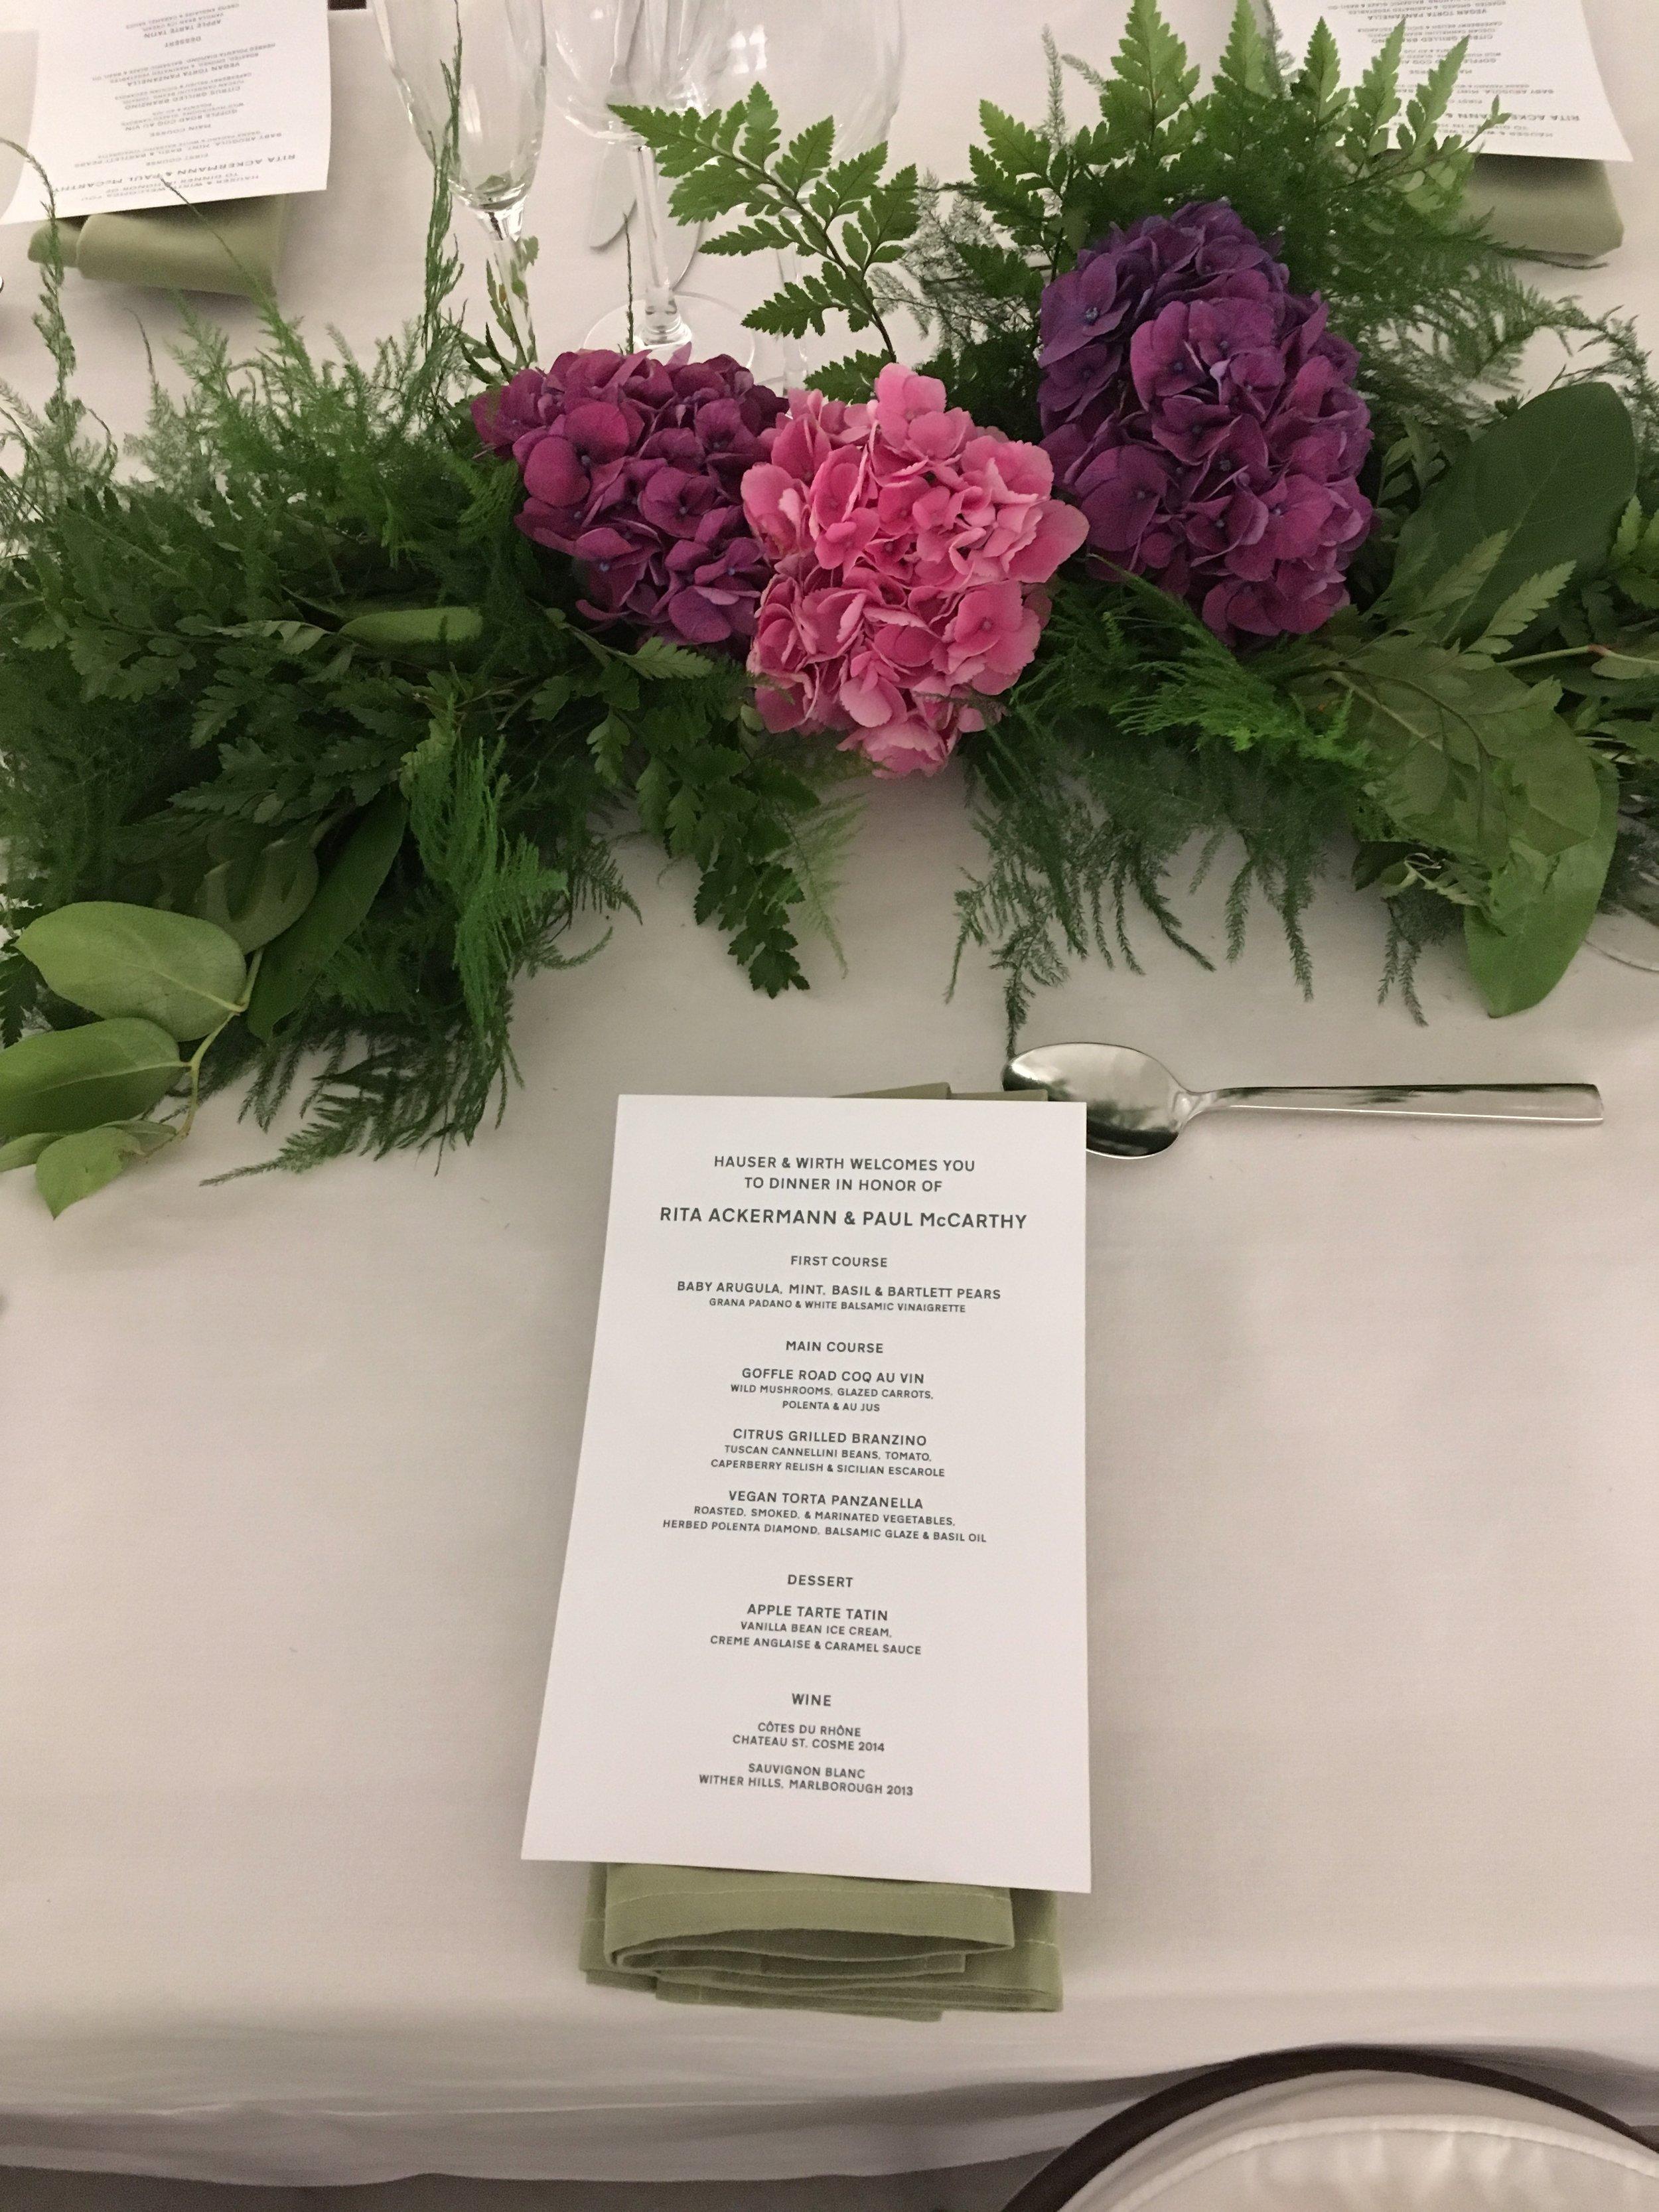 Rita Ackermann & Paul Mc Carthy Dinner at Hauser and Wirth